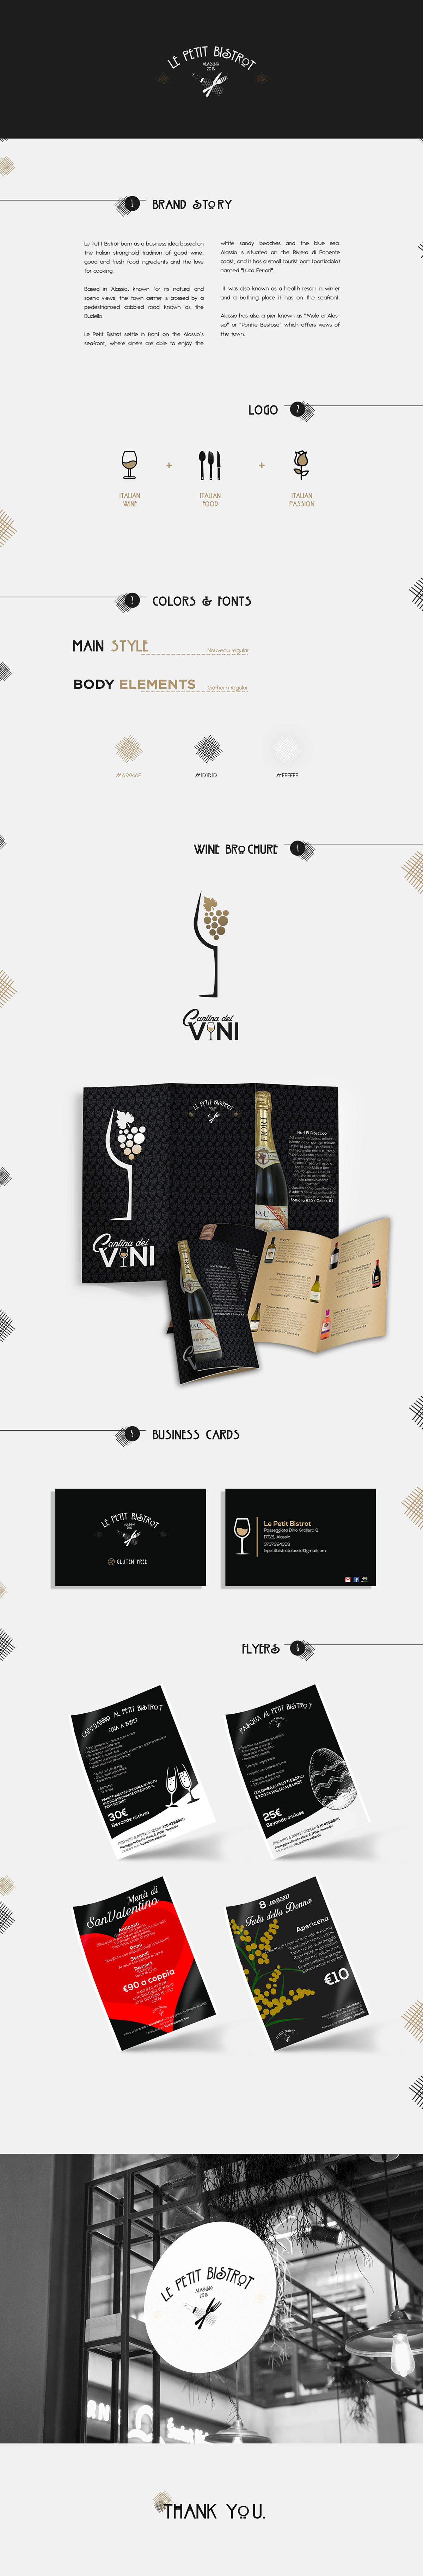 logo restaurant branding  Business Cards flyers italian restaurant restaurant design food and beverage brochure design menu restaurant